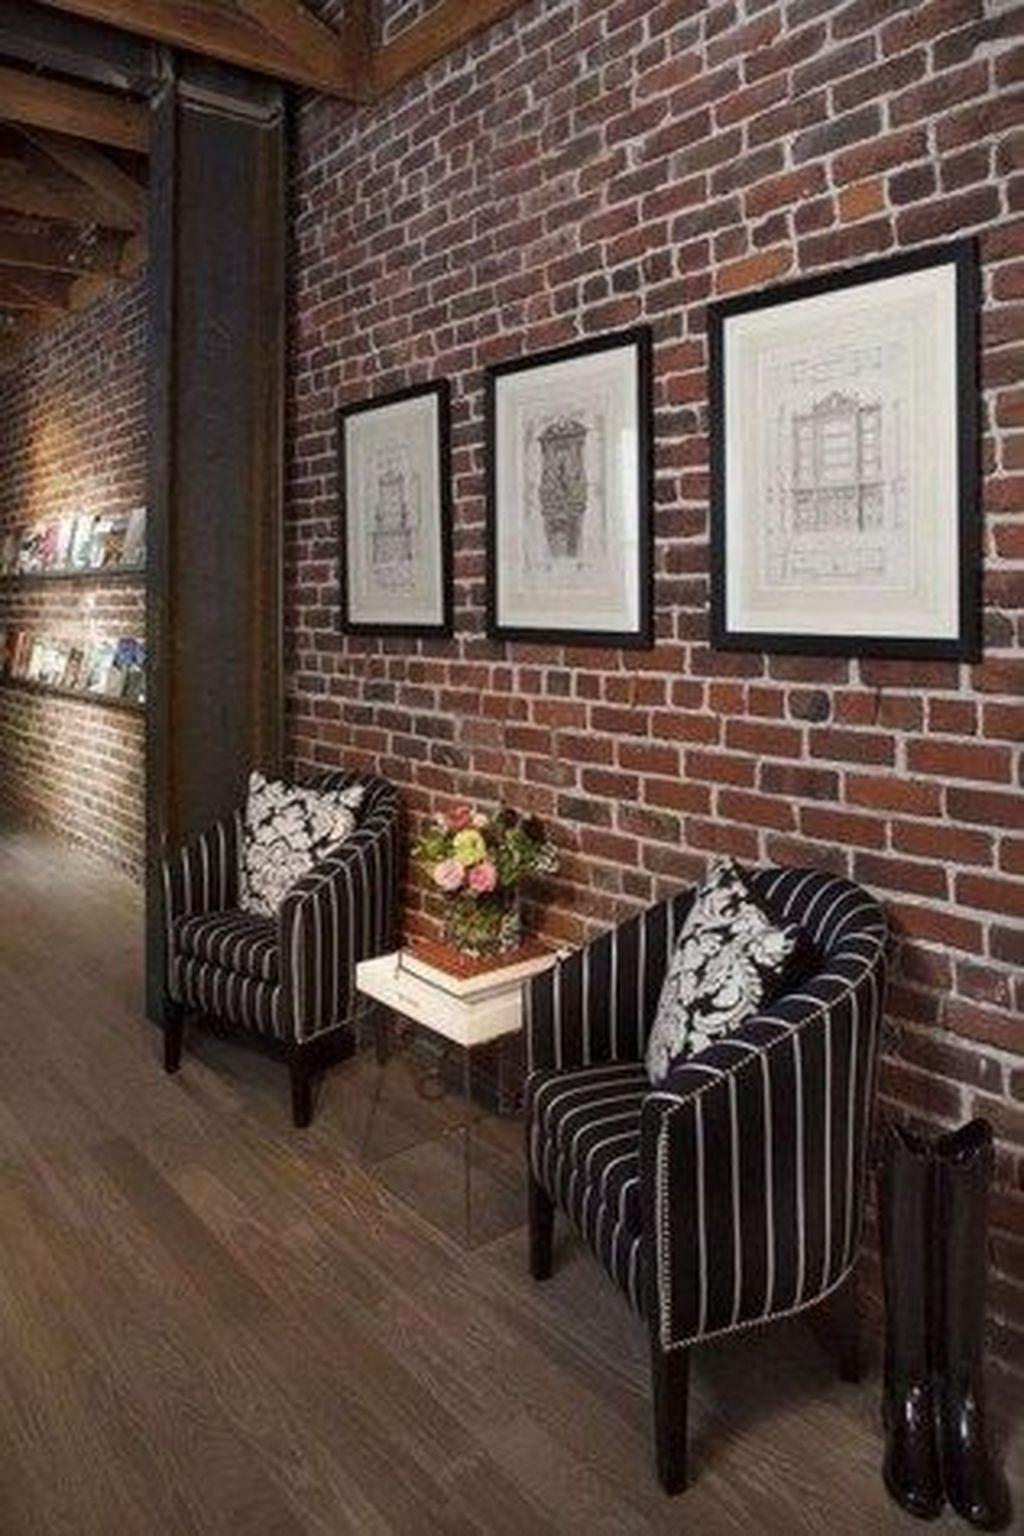 20 Delicate Exposed Brick Wall Ideas For Interior Home Design Brick Interior Brick Wall Living Room Brick Wall Decor